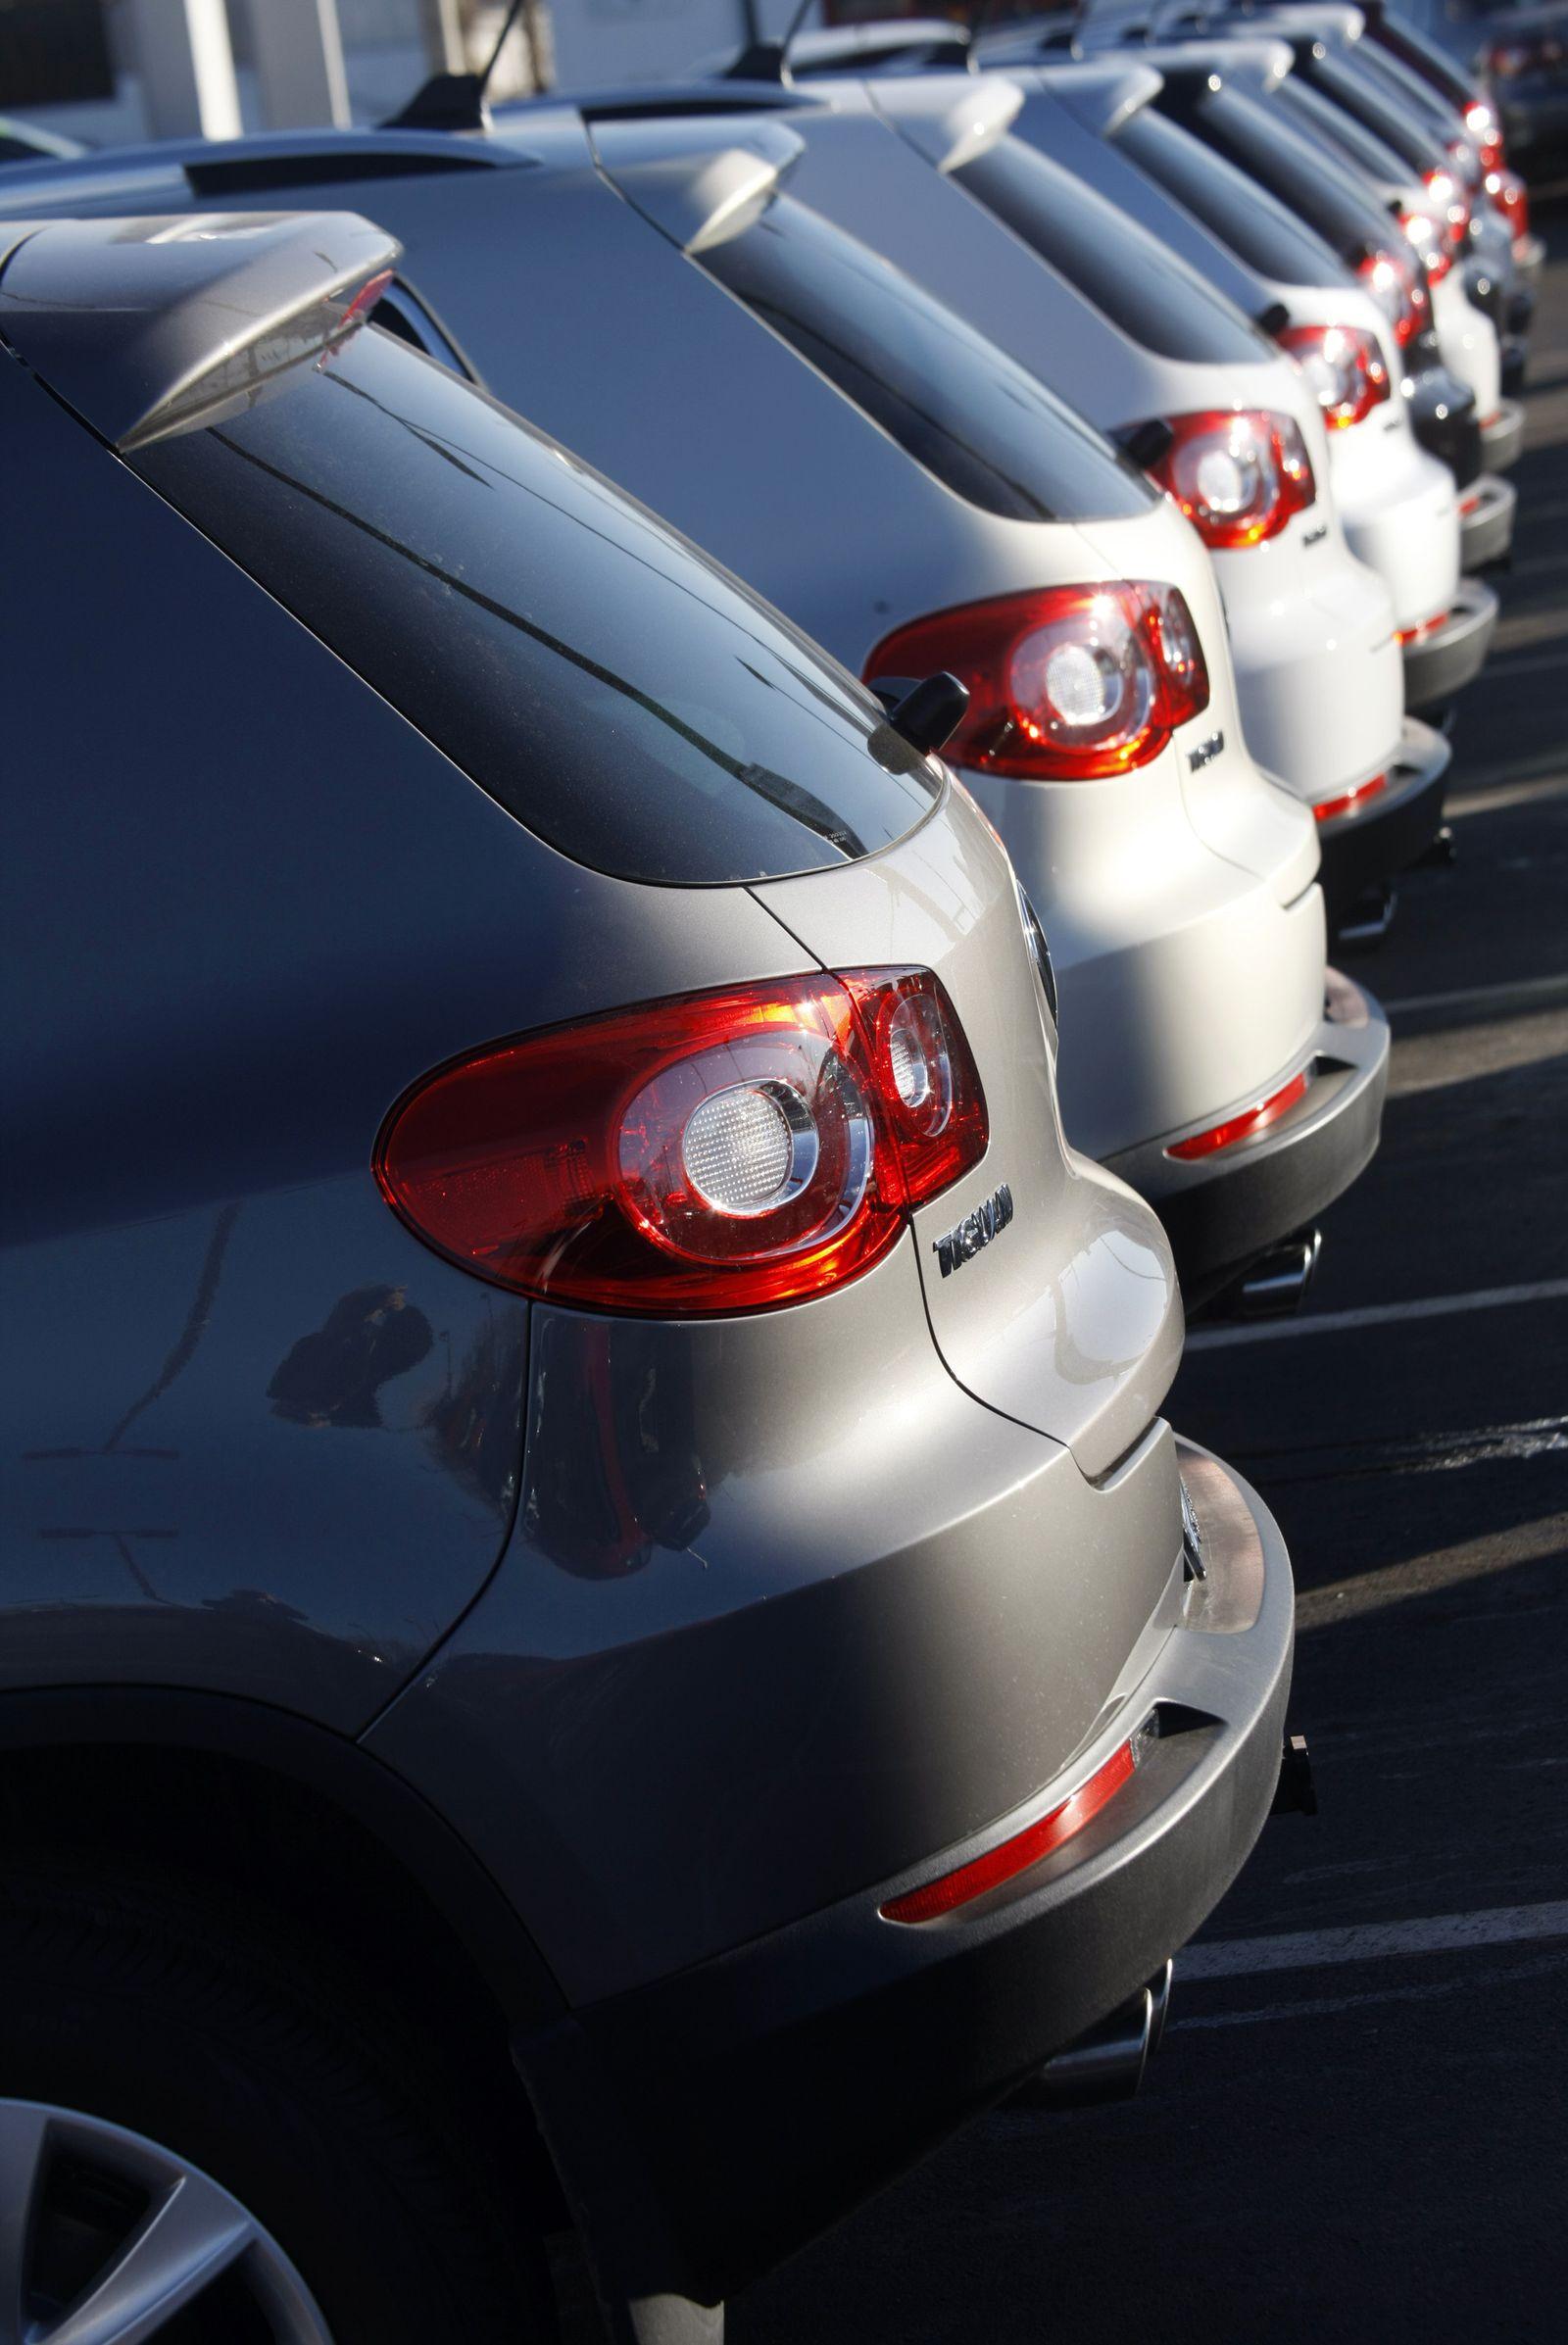 VW Tiguan/ USA